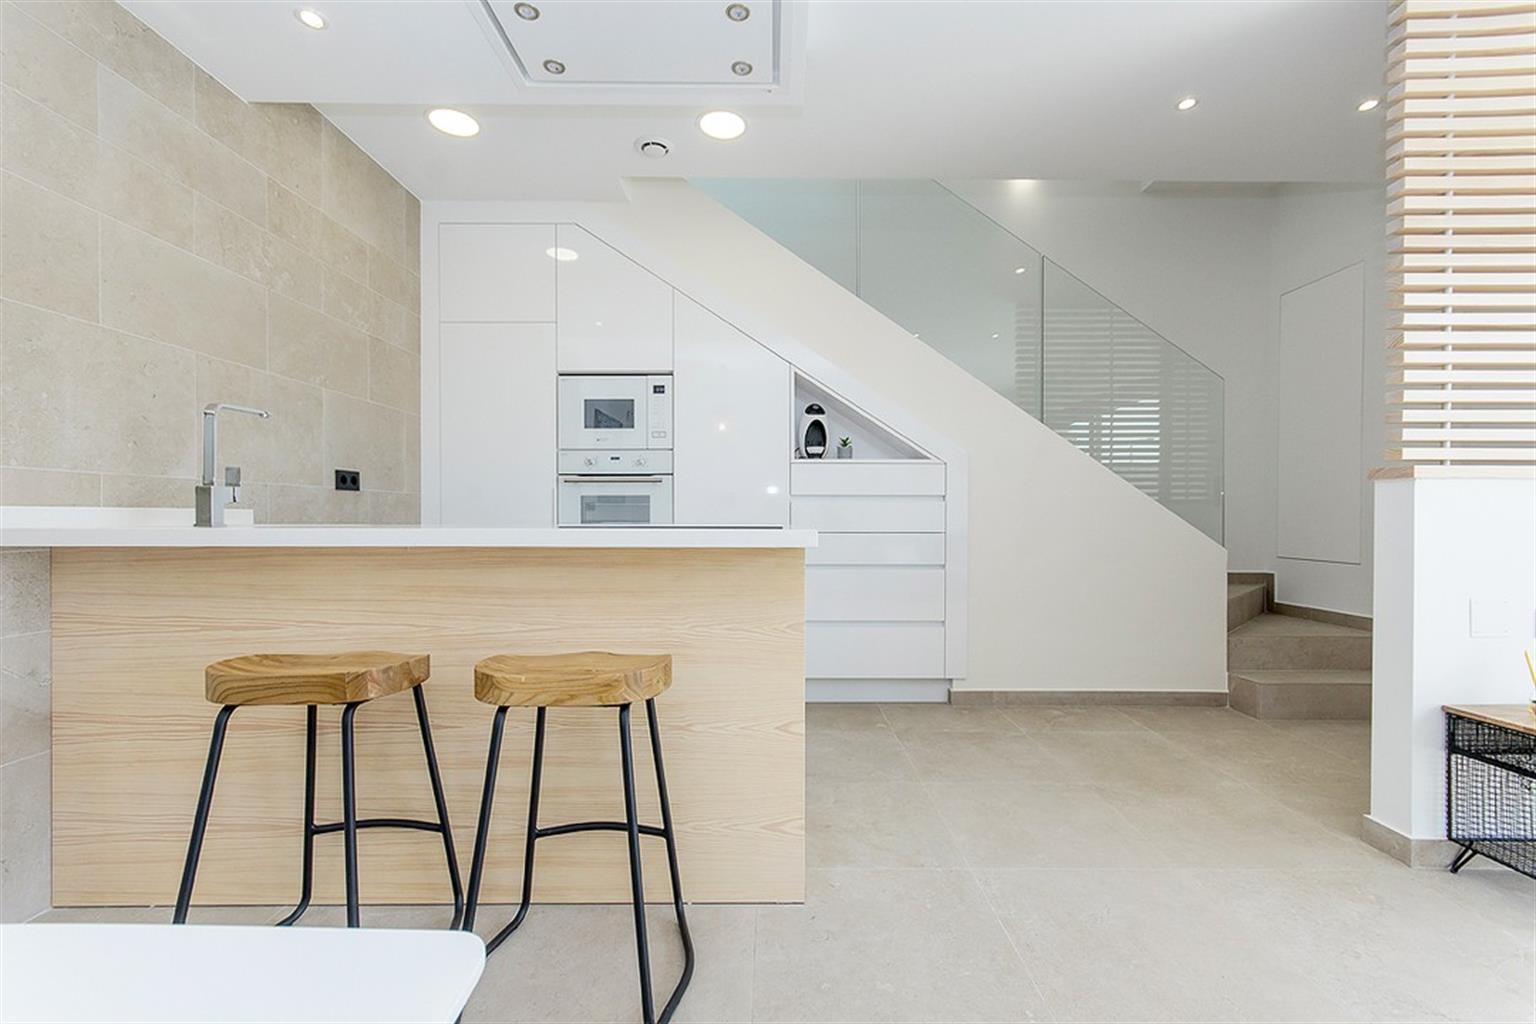 Maison - Benijofar  - #4231530-35